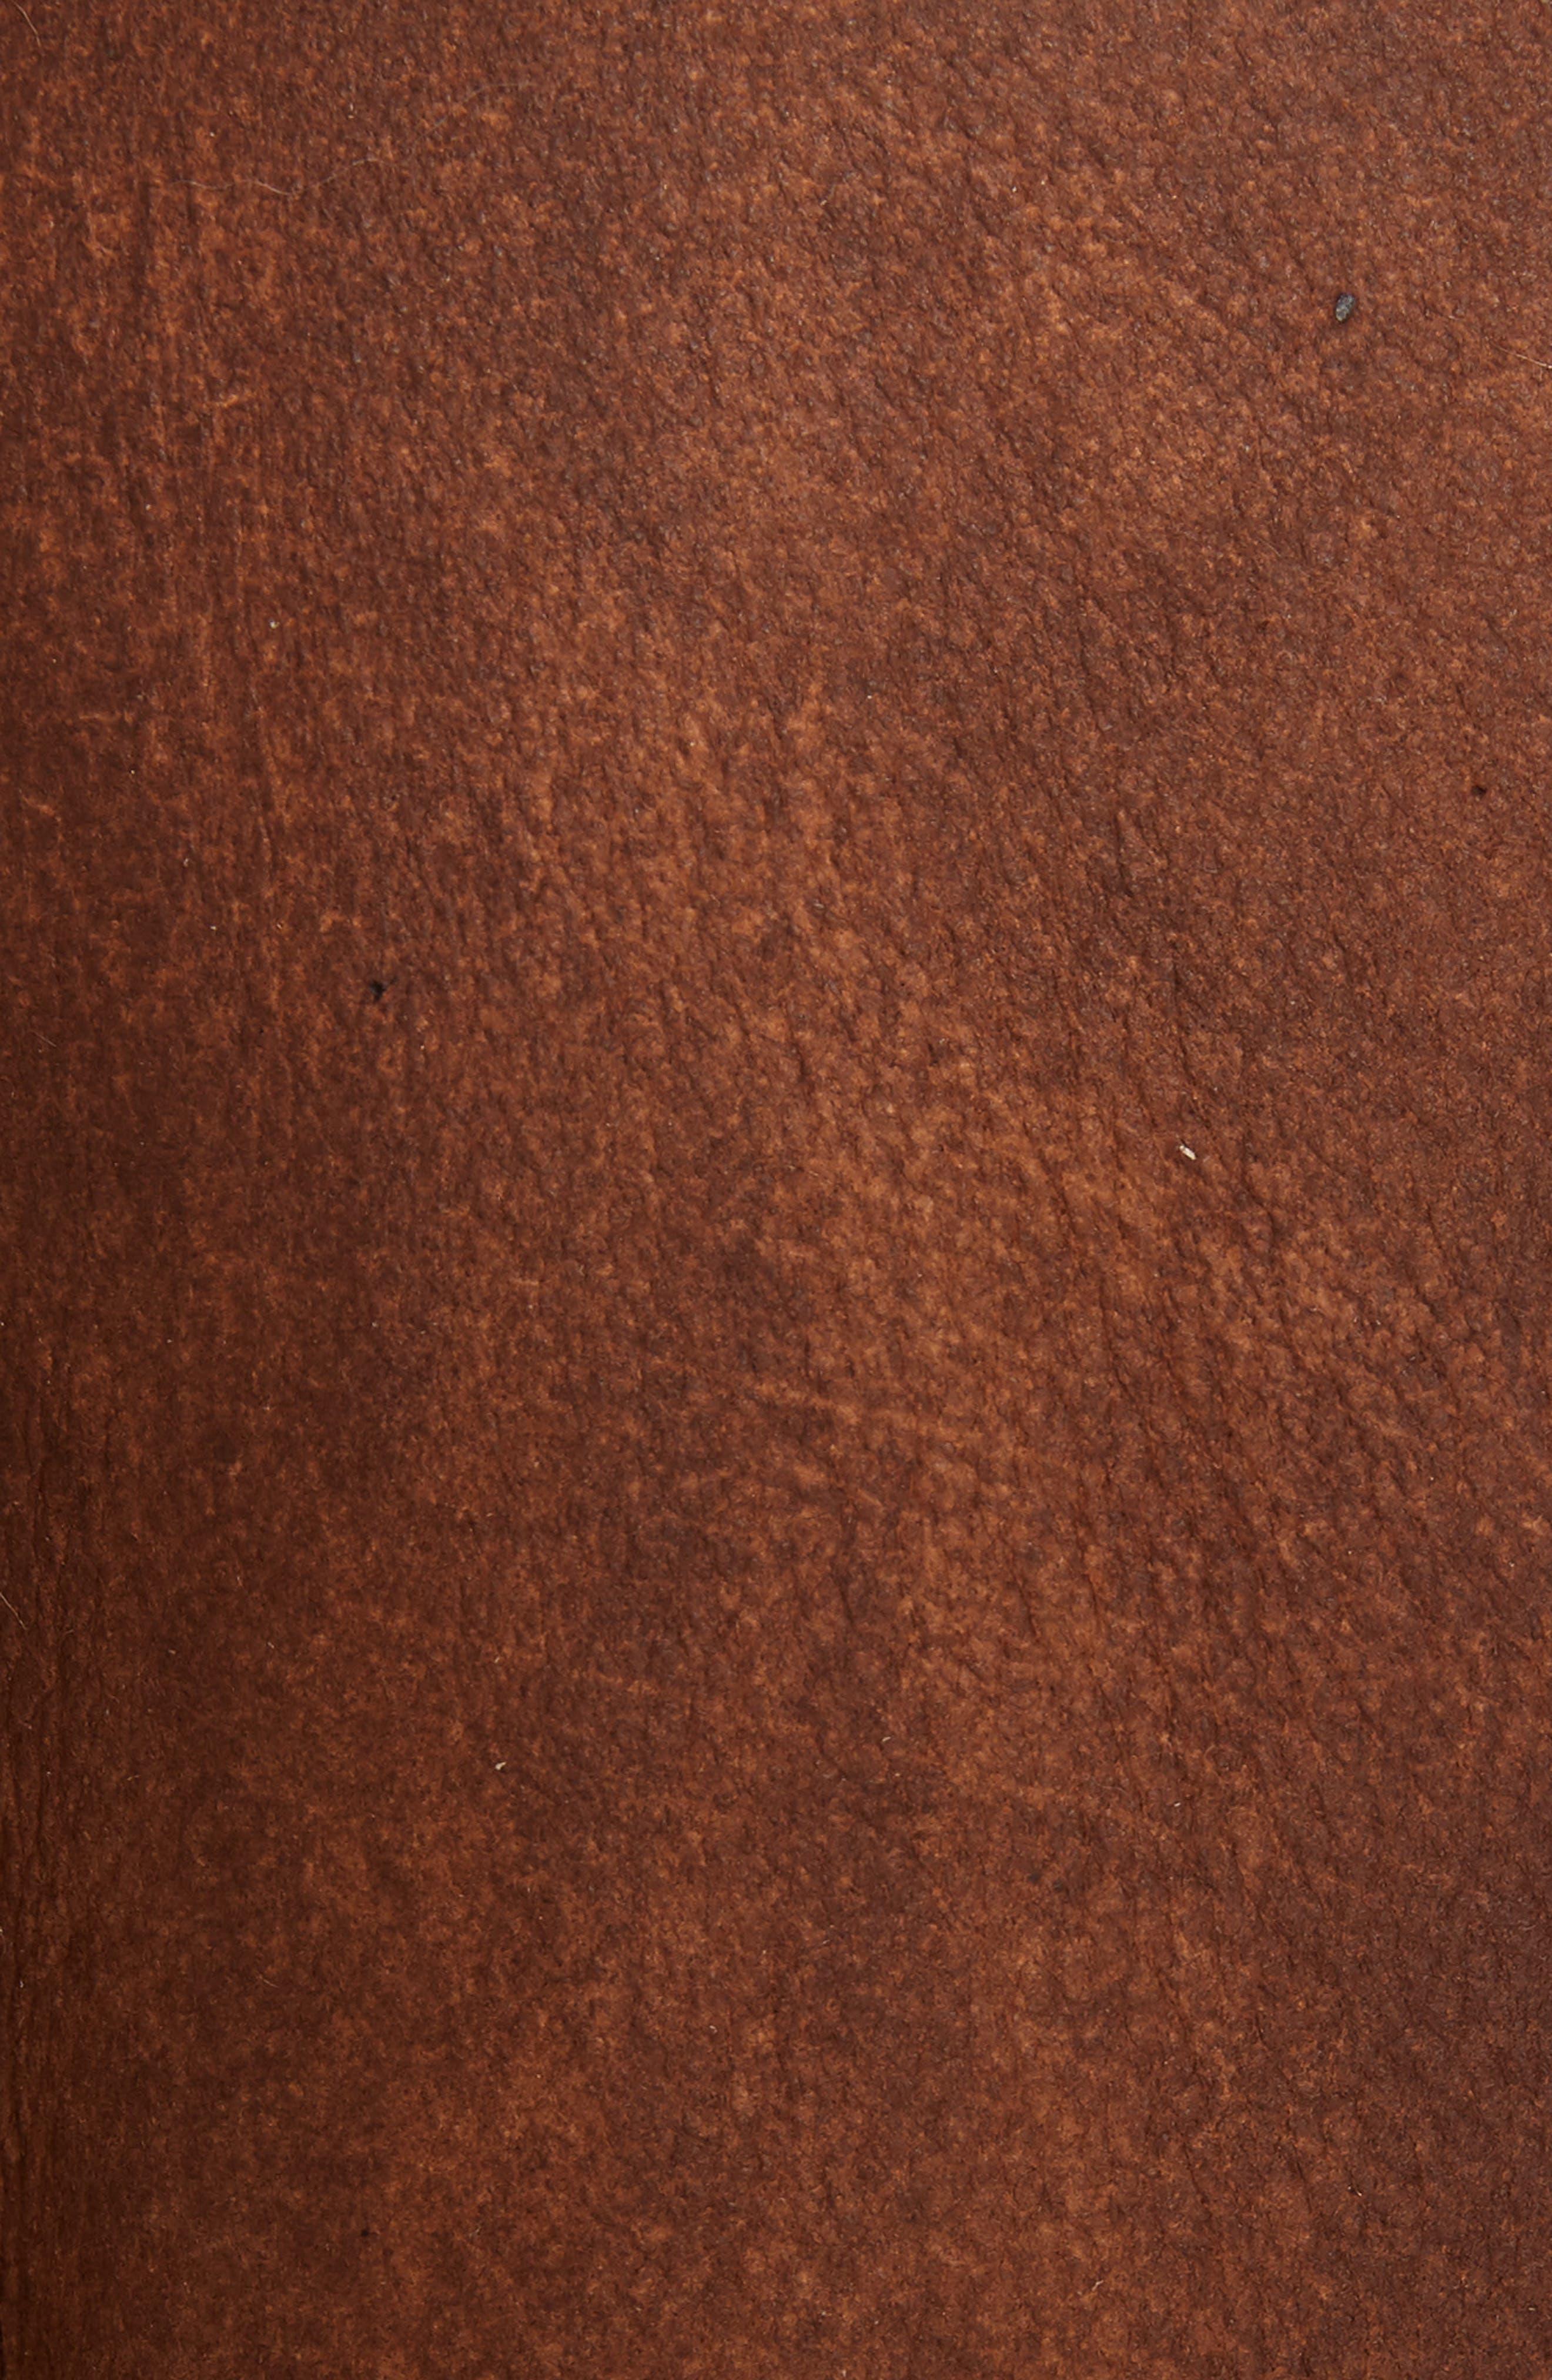 Genuine Shearling Aviator Jacket,                             Alternate thumbnail 6, color,                             BROWN